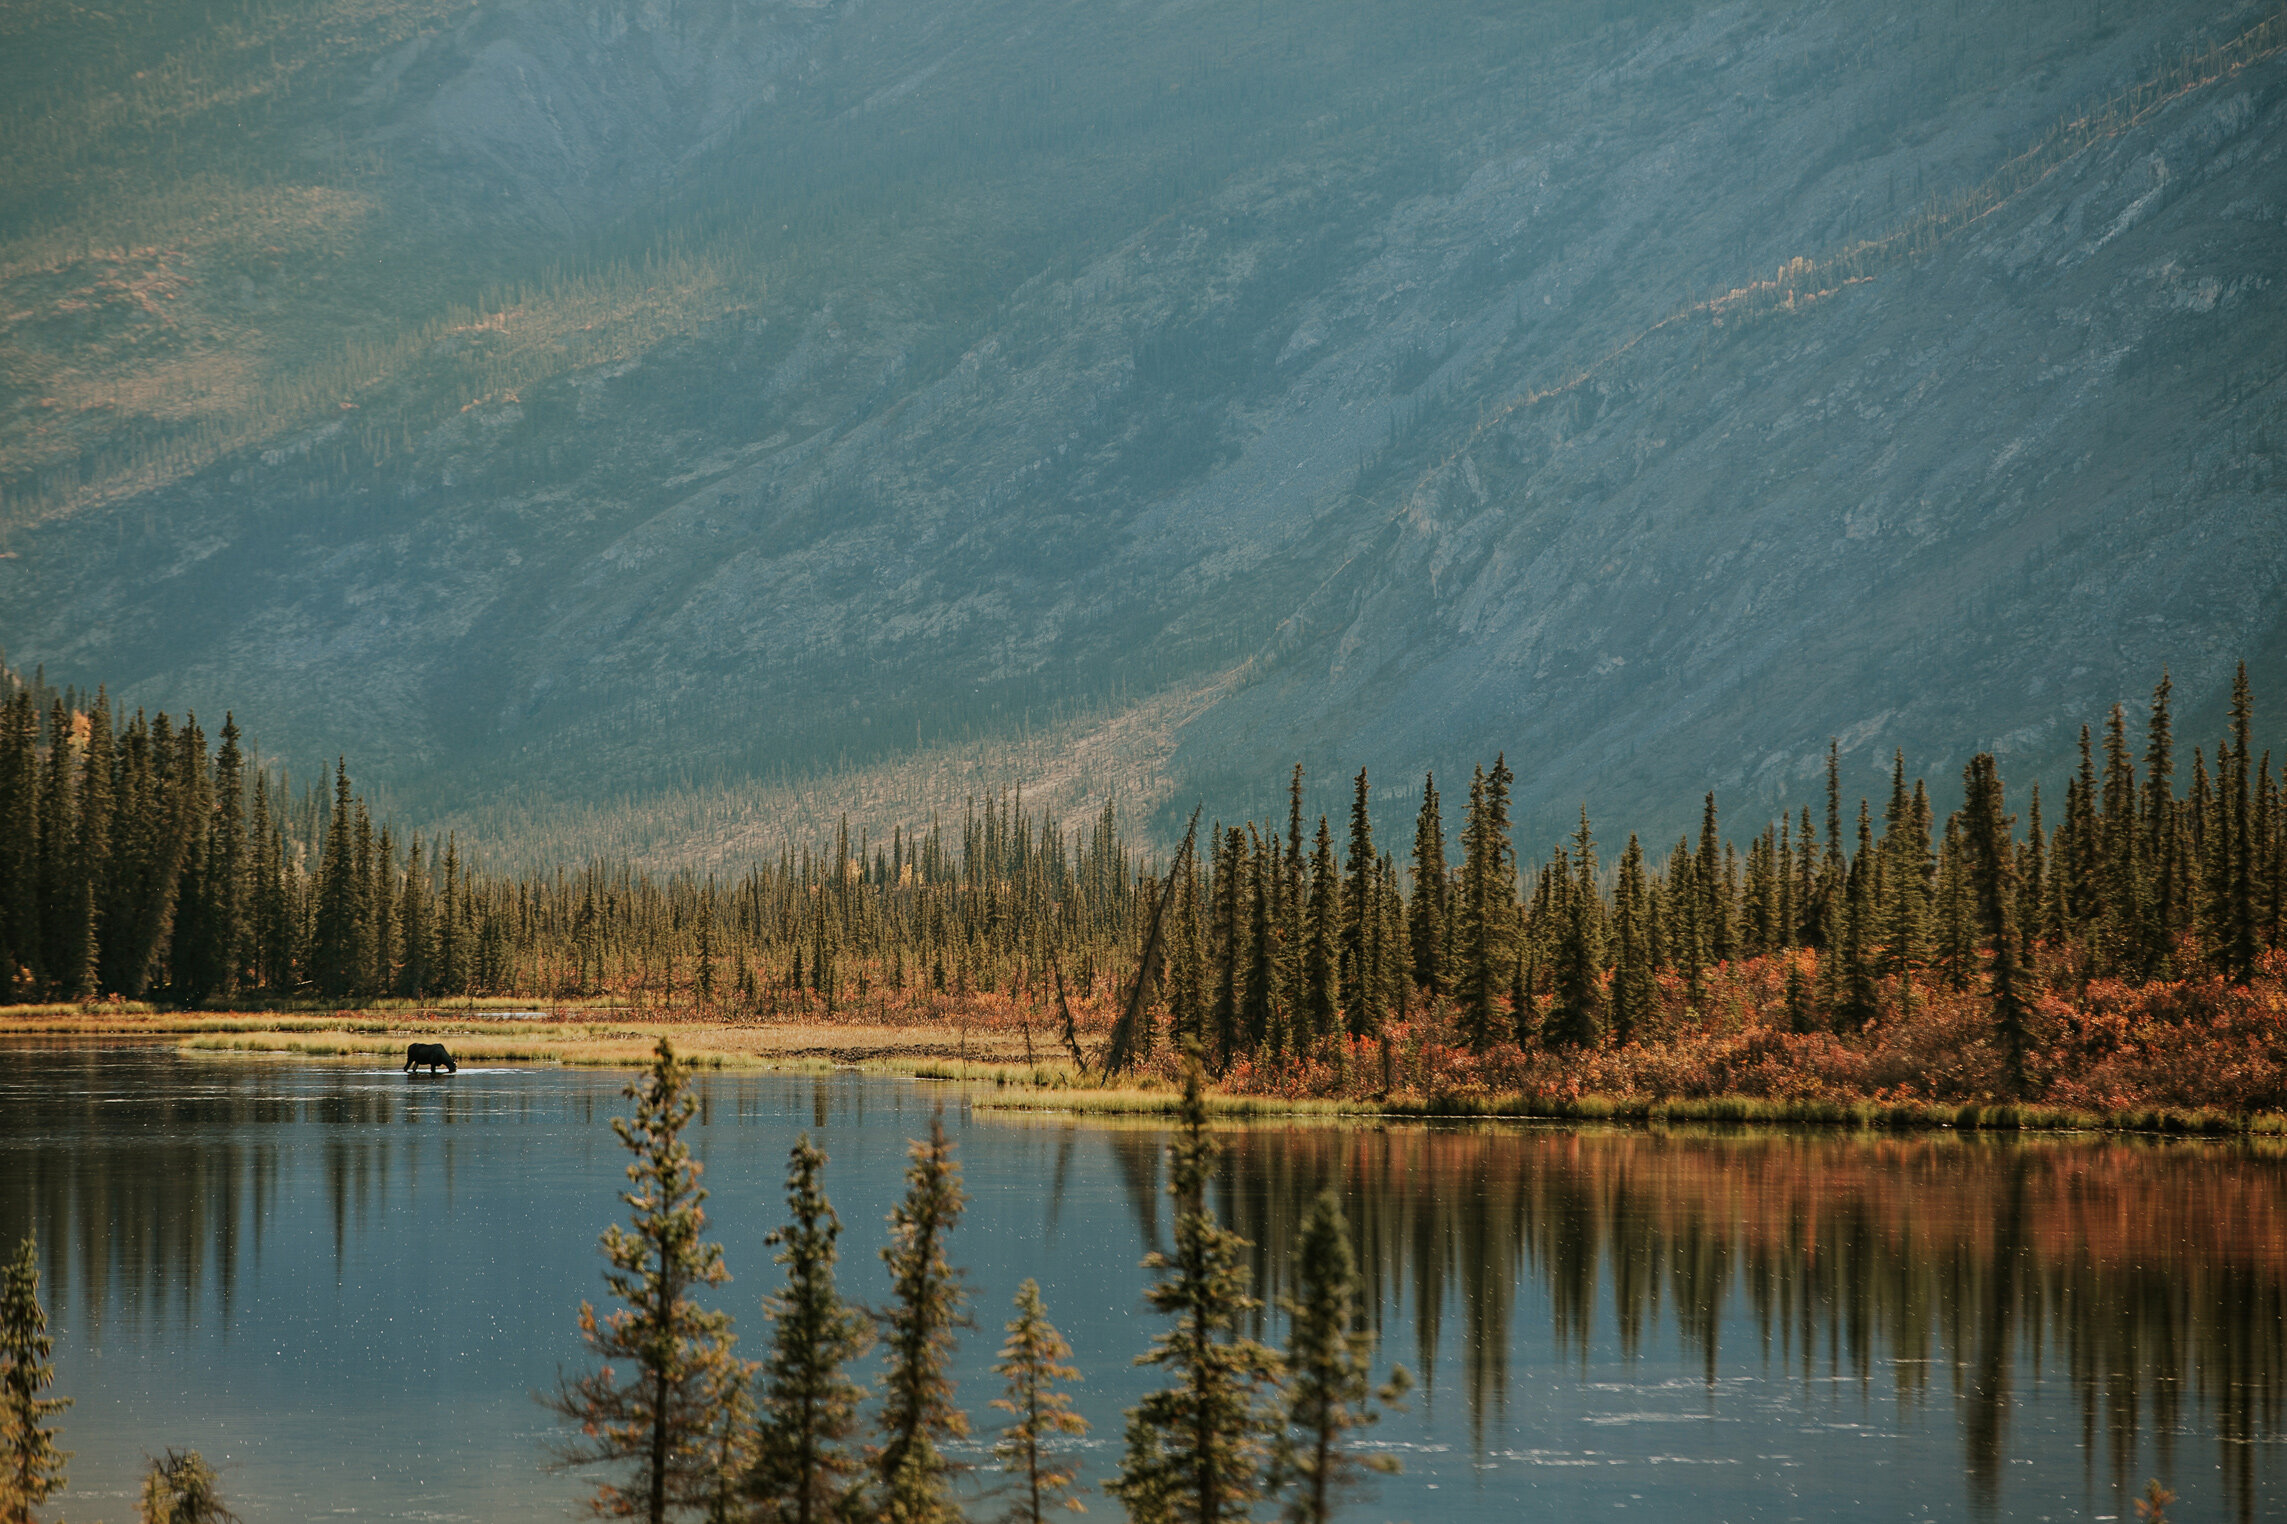 CindyGiovagnoli_Road_Trip_Travel_National_Parks_Explore_America-098.jpg